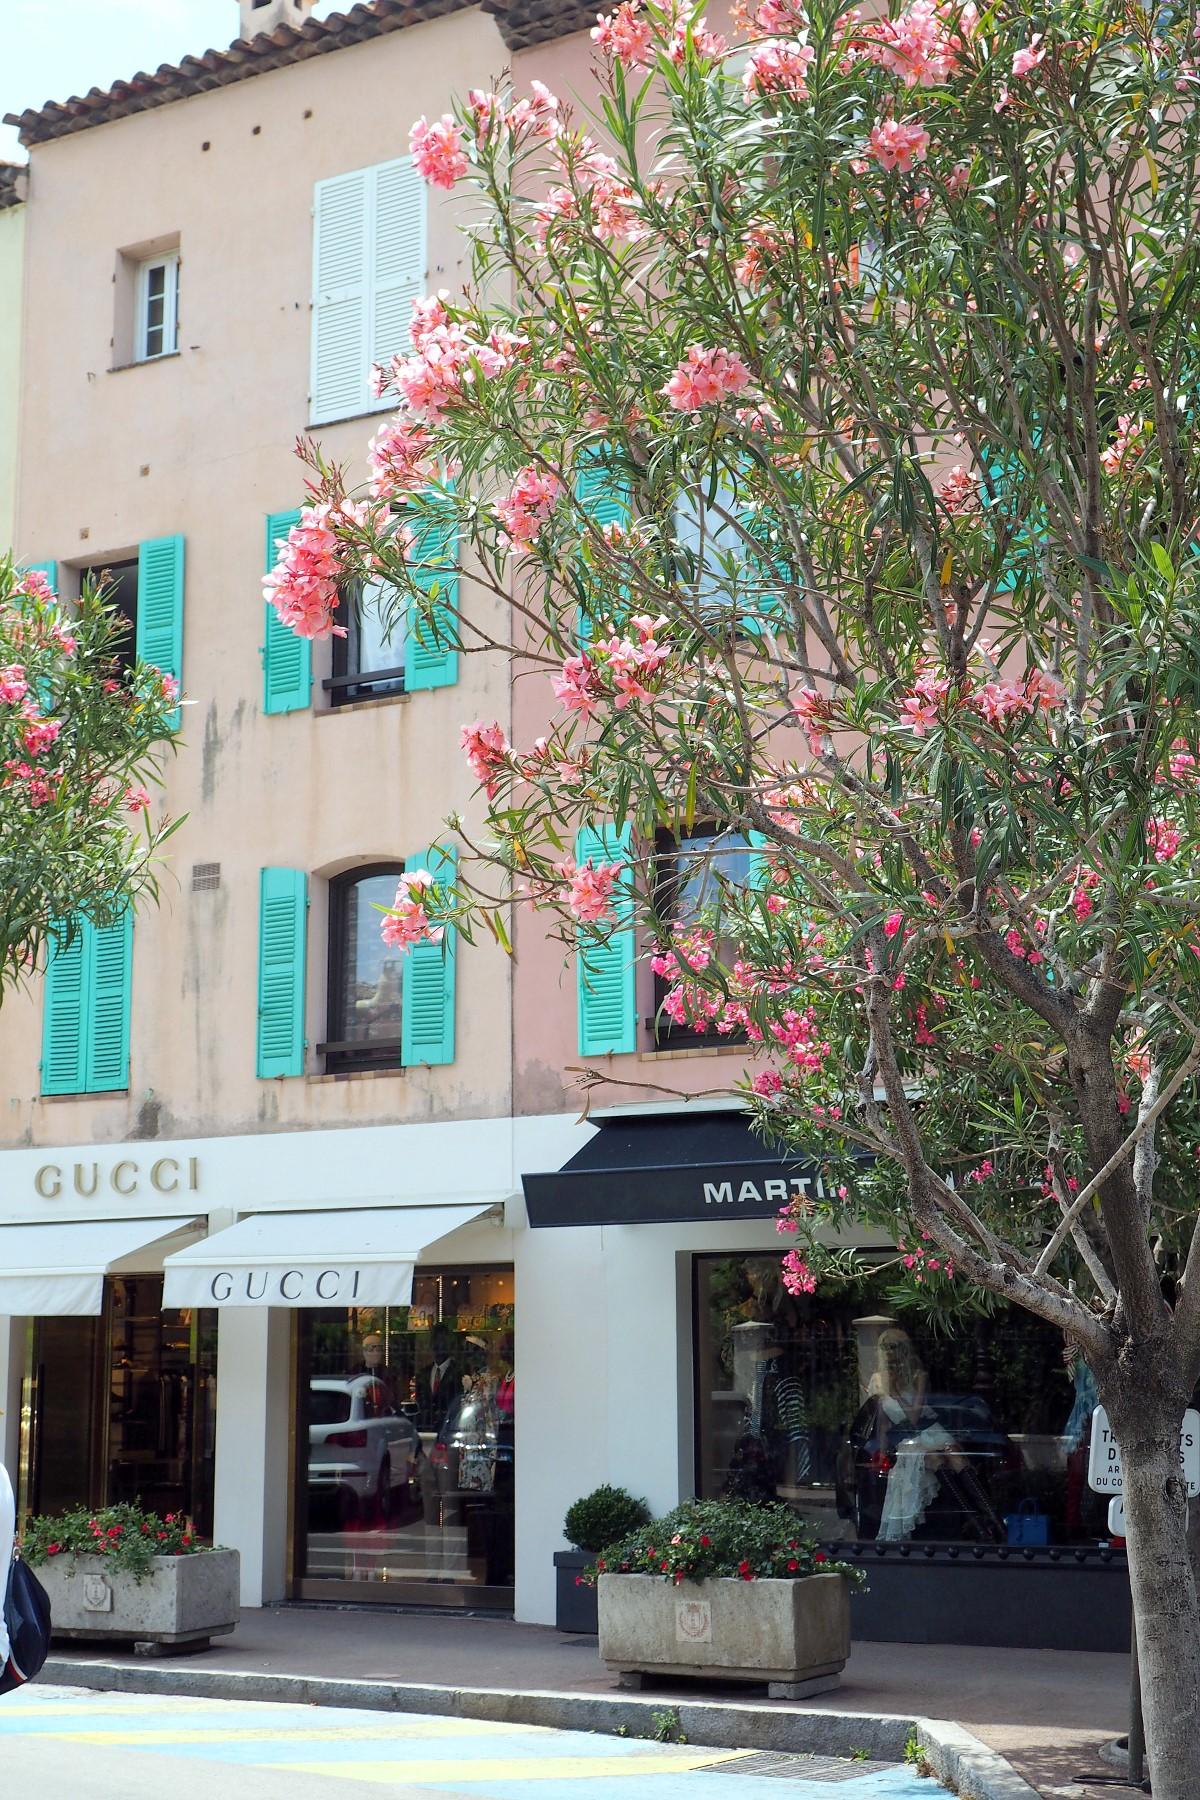 Gucci-St-Tropez-Cote-dAzur